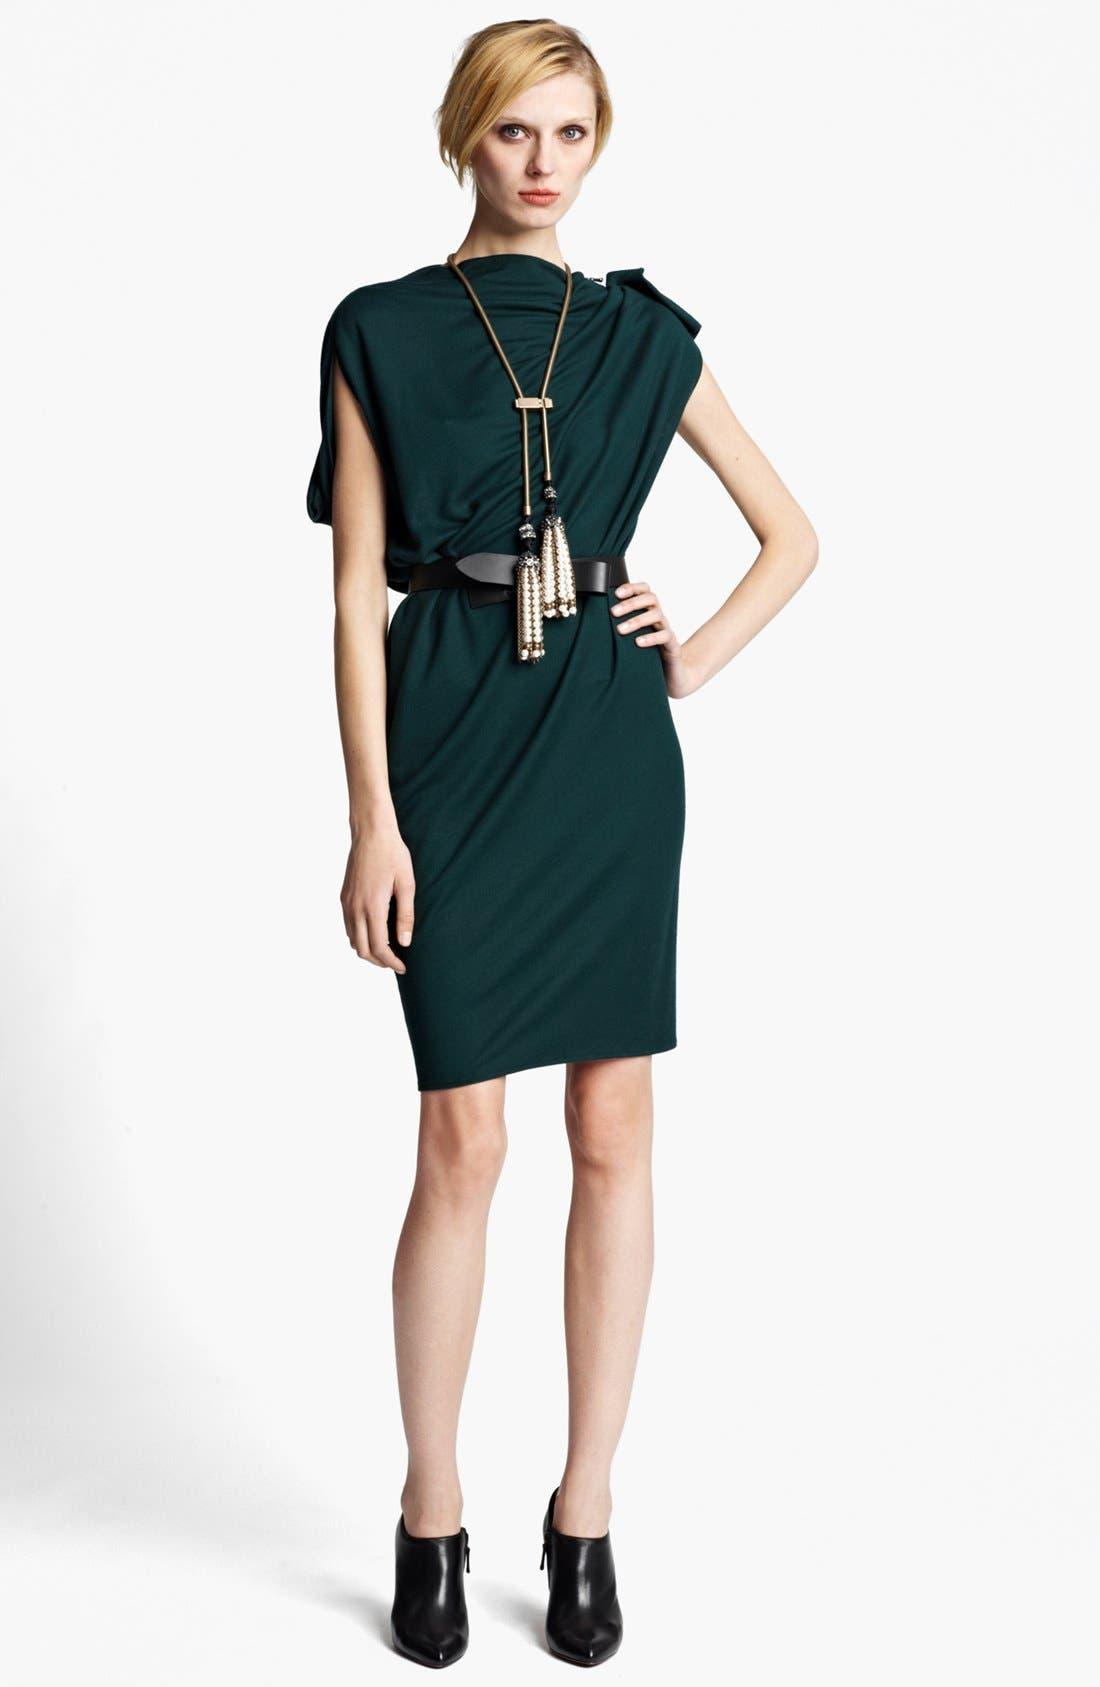 Main Image - Lanvin Dress & Accessories